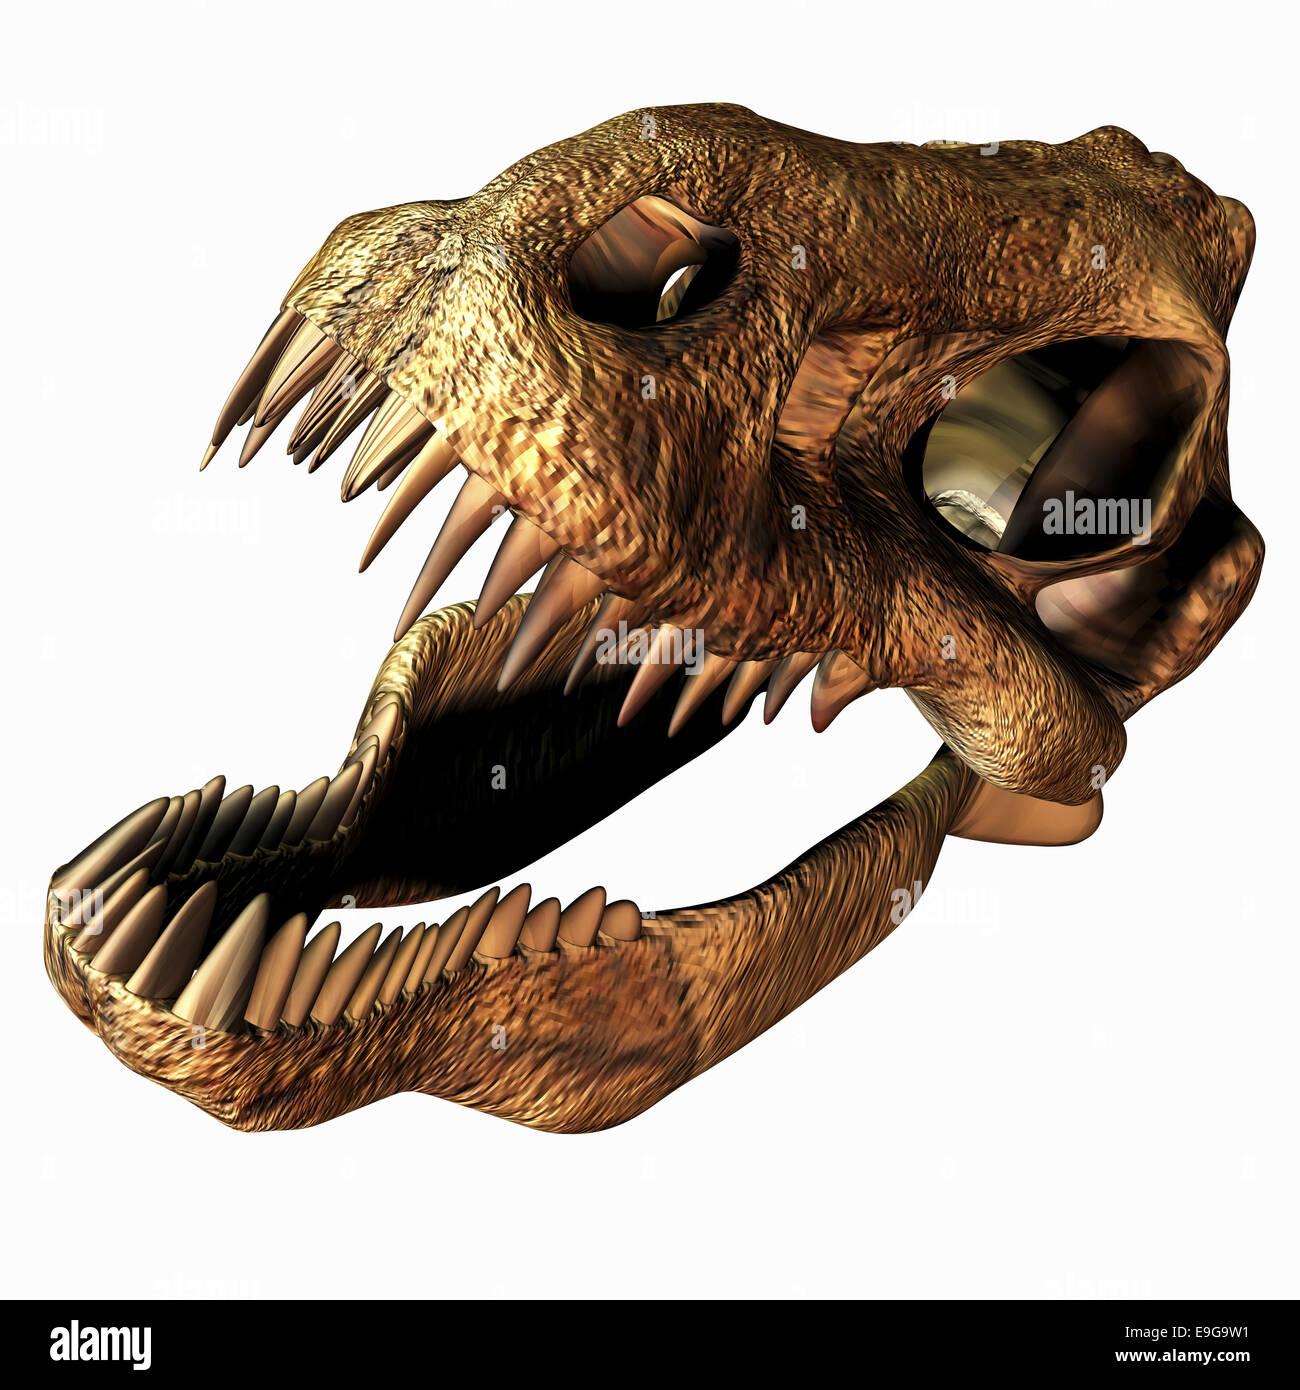 Tyrannosaurus Rex Anatomy Stock Photos & Tyrannosaurus Rex Anatomy ...